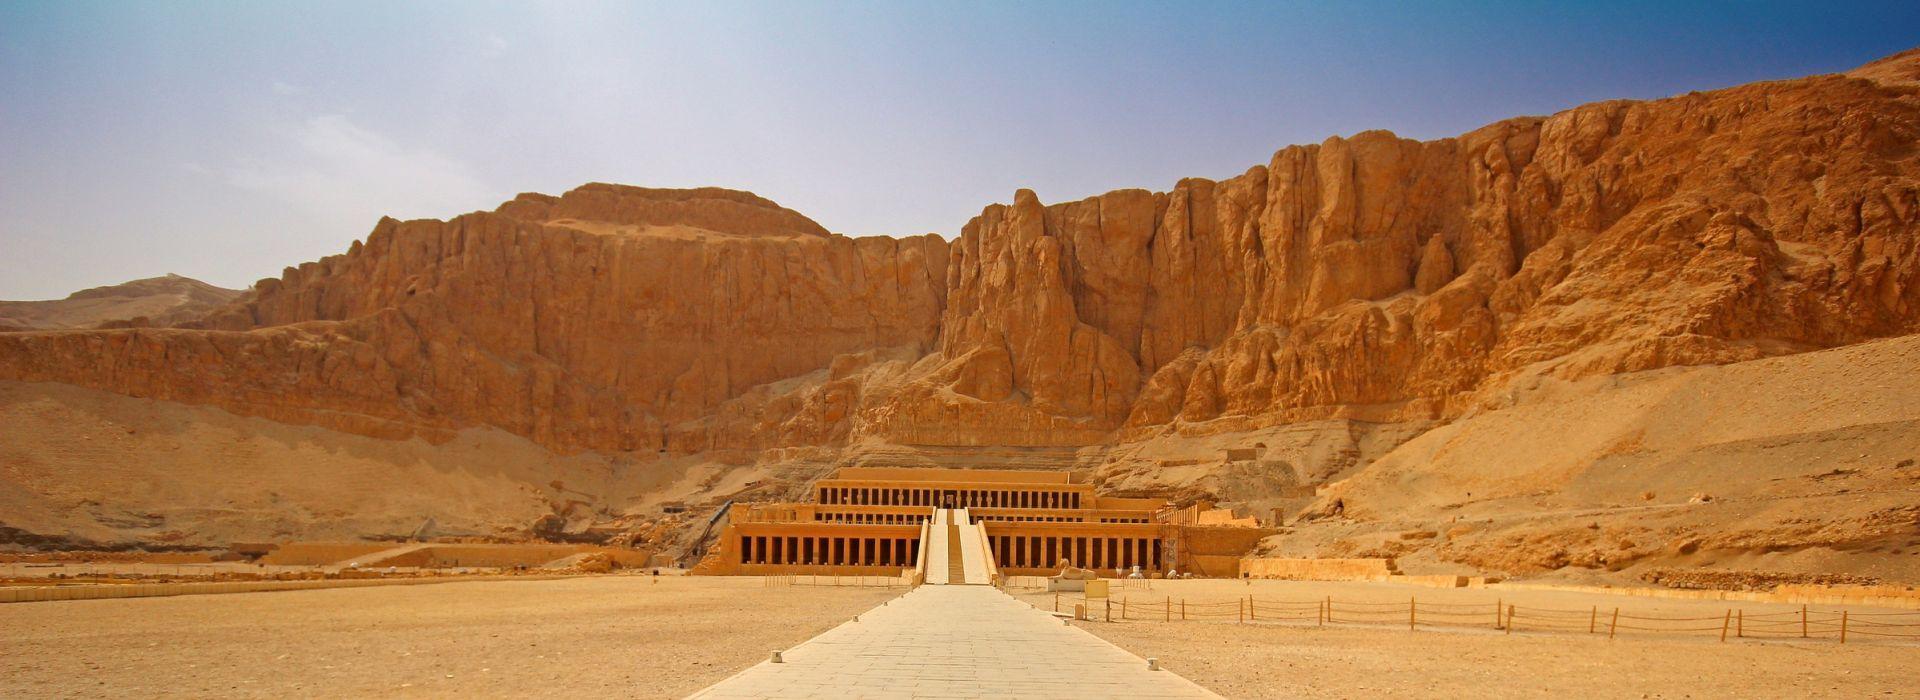 Family Tours in Egypt